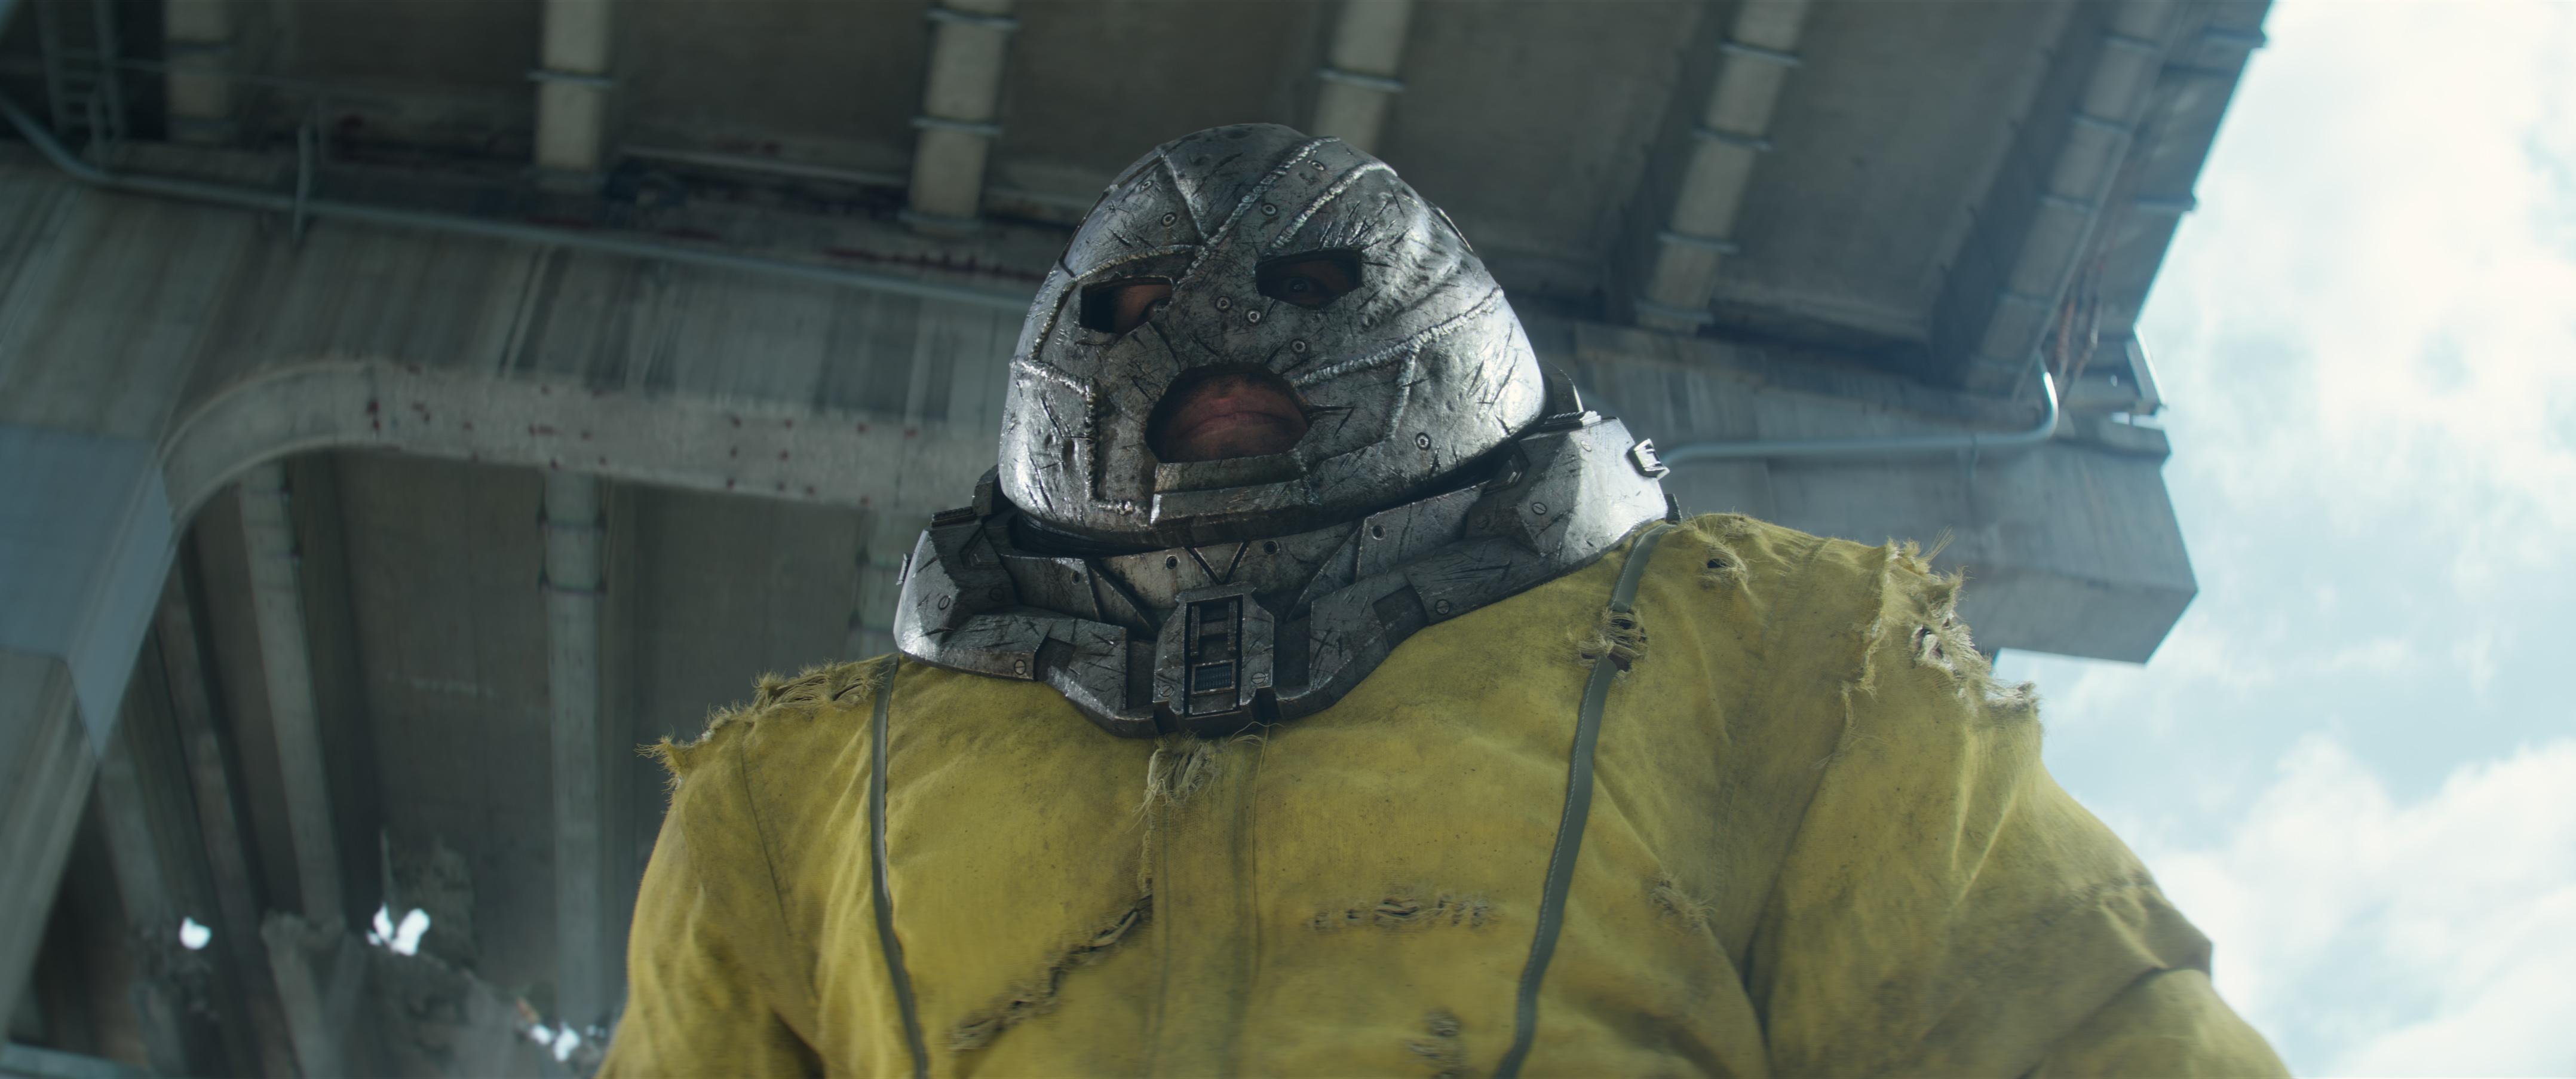 Juggernaut In Deadpool 2 Hd Movies 4k Wallpapers Images